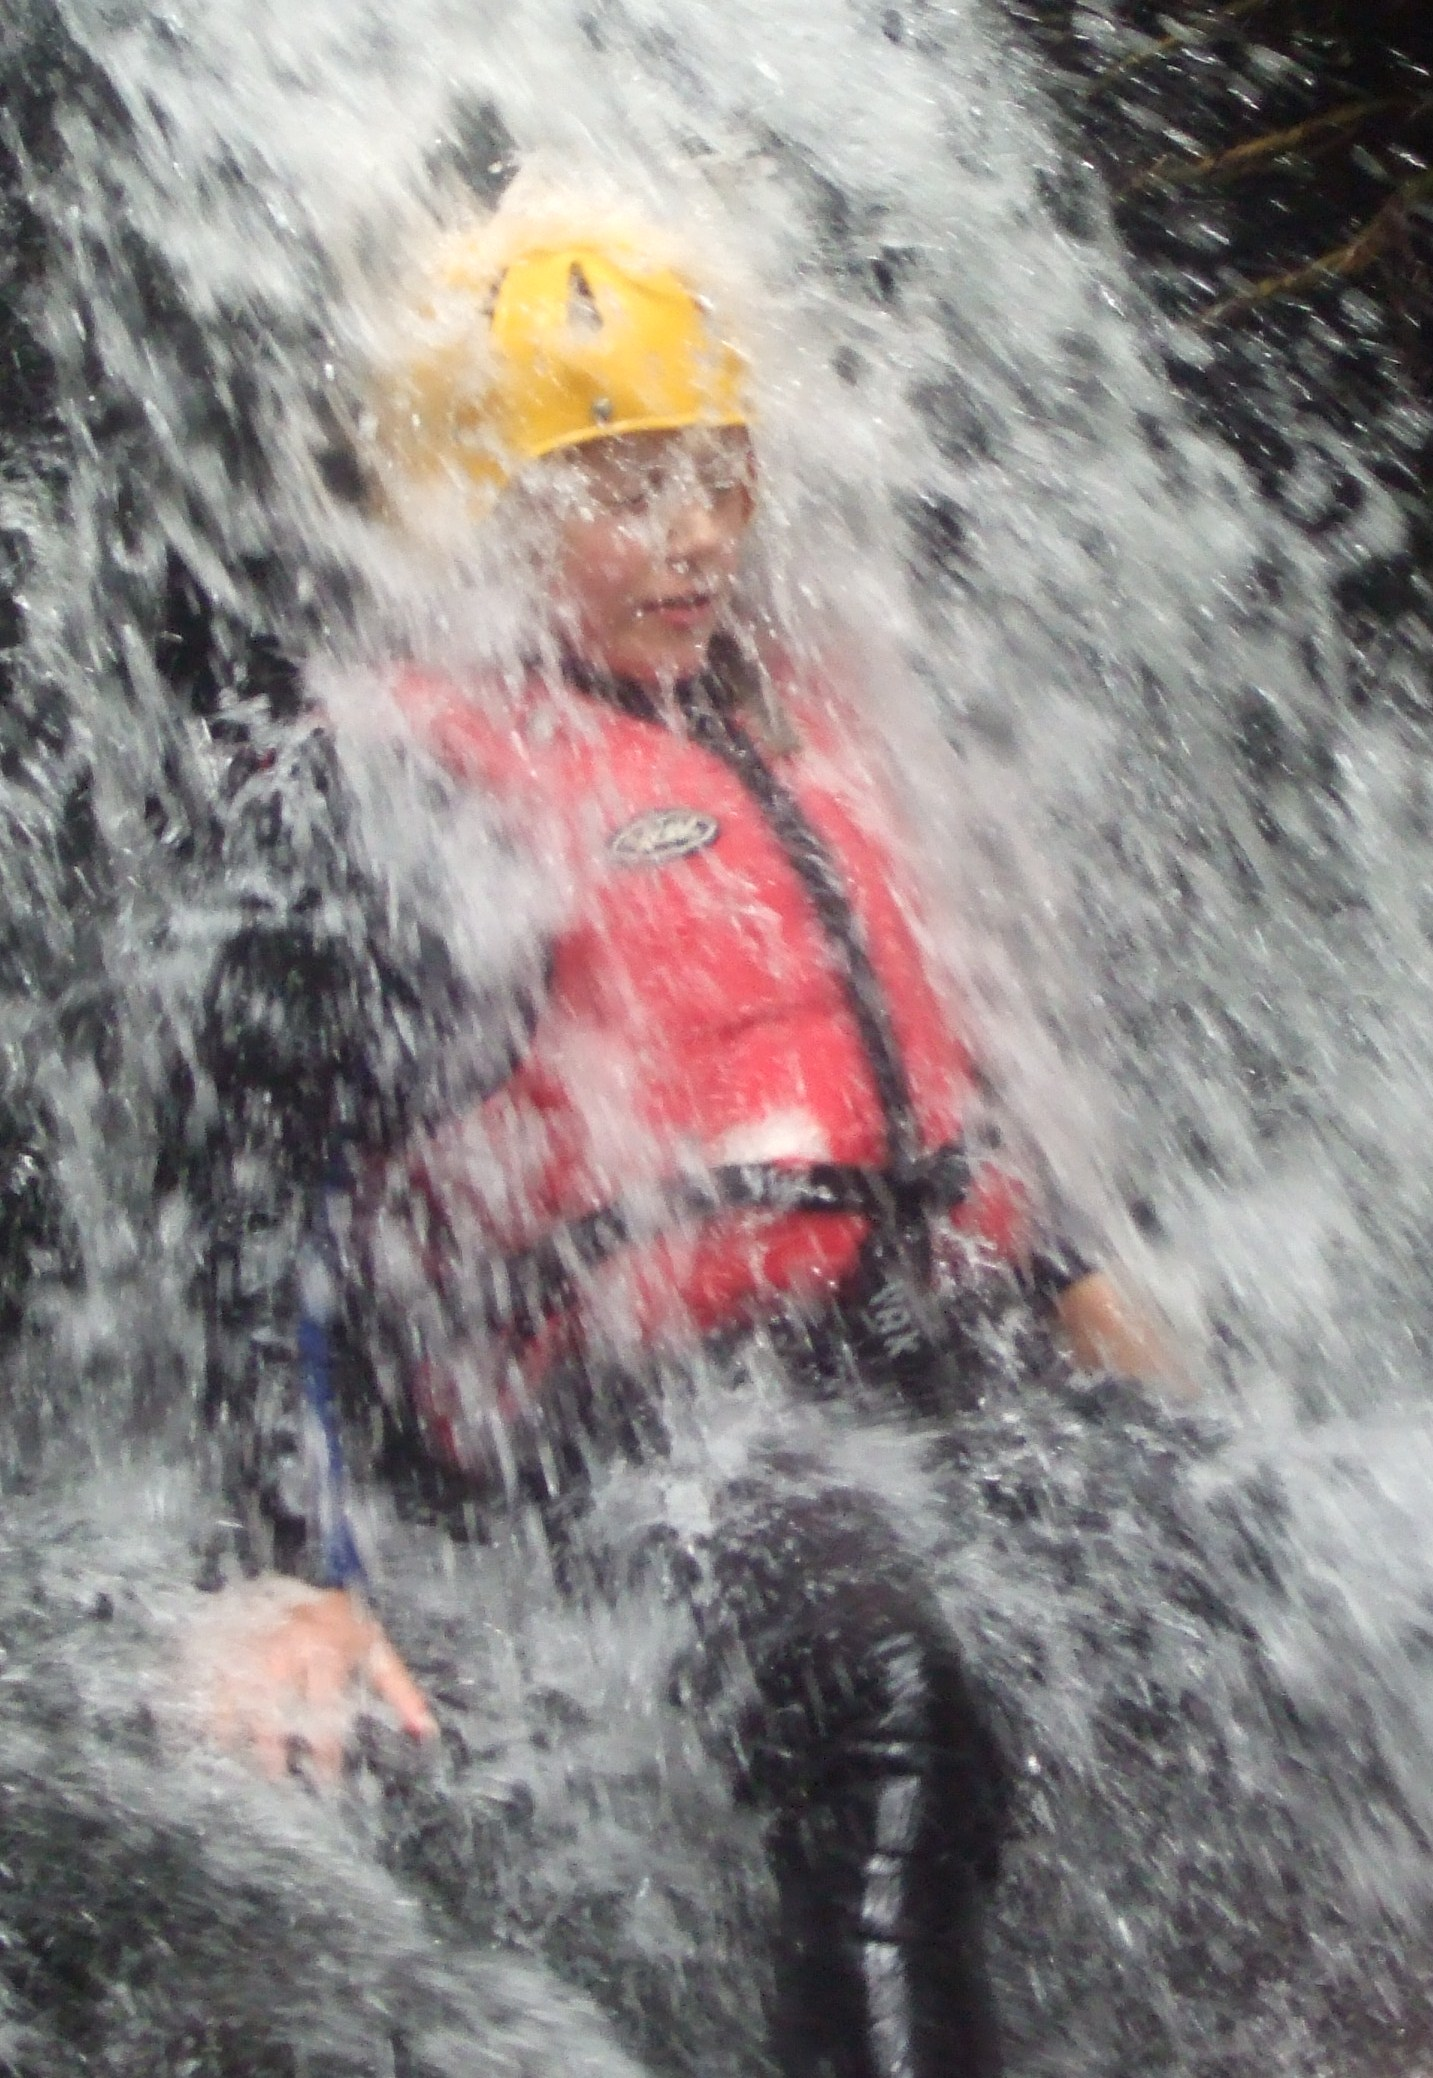 Gorge Walking Stream Scramble Waterfall